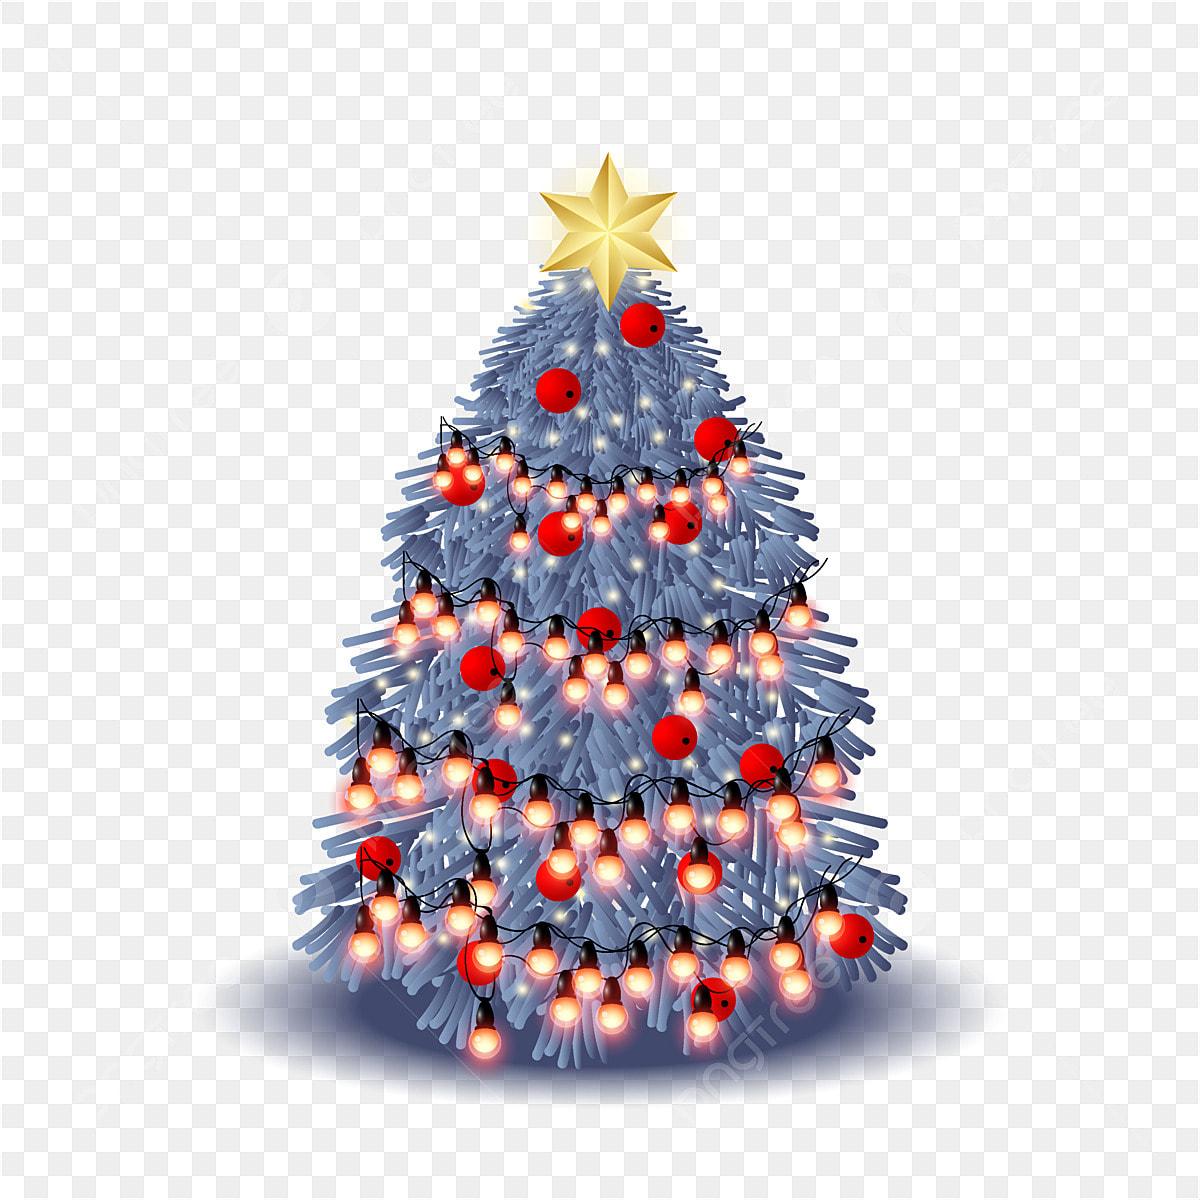 Beautiful Christmas Tree Design With Decorative Lights, Christmas ...